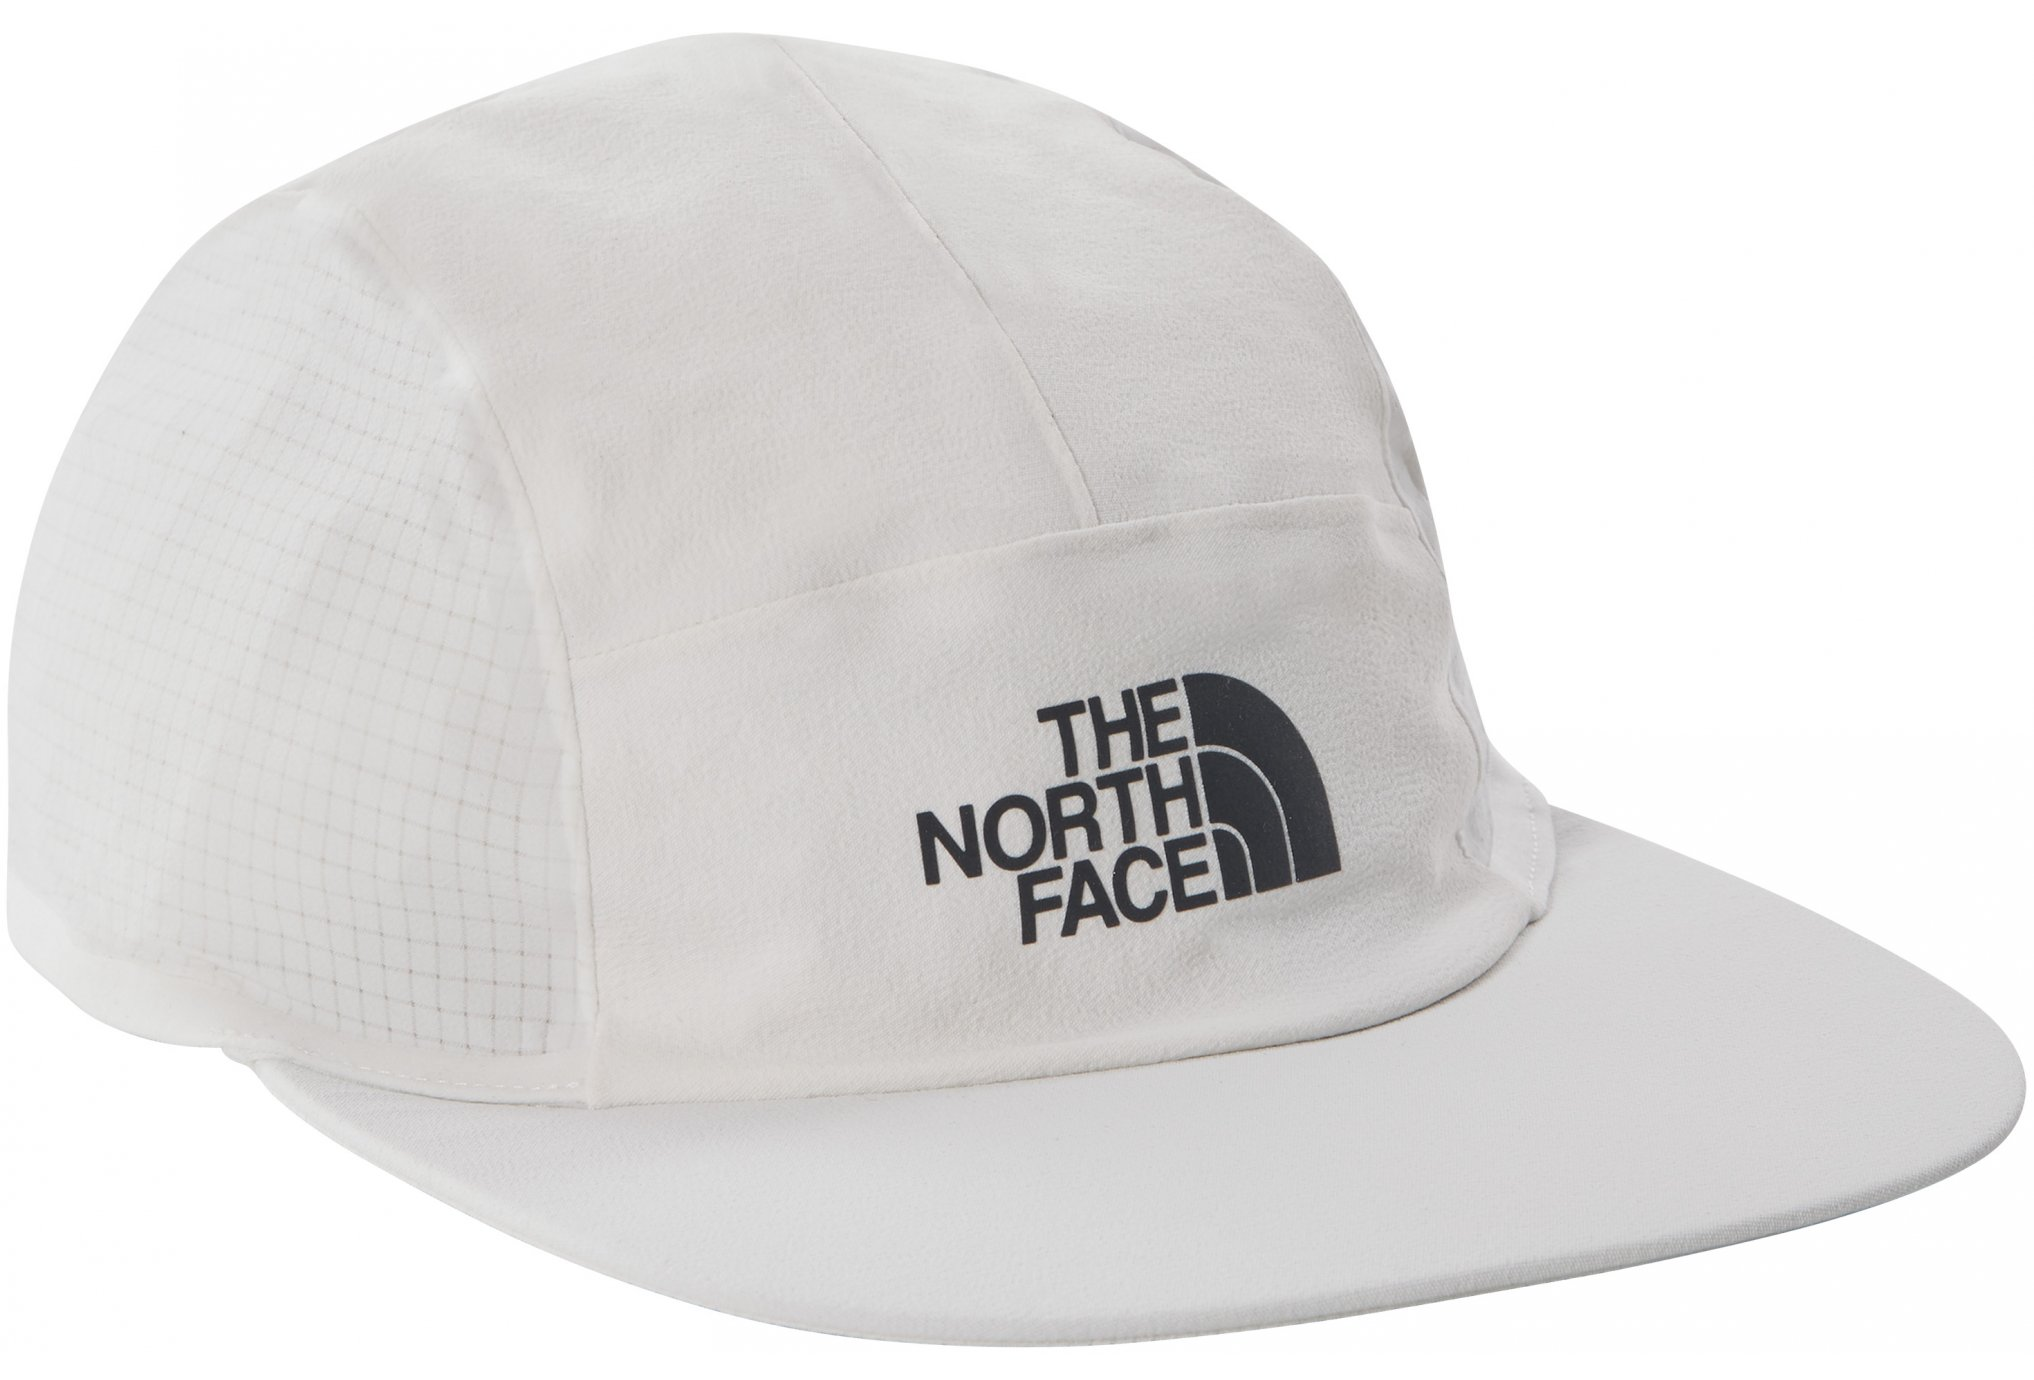 The North Face Flight Series Casquettes / bandeaux